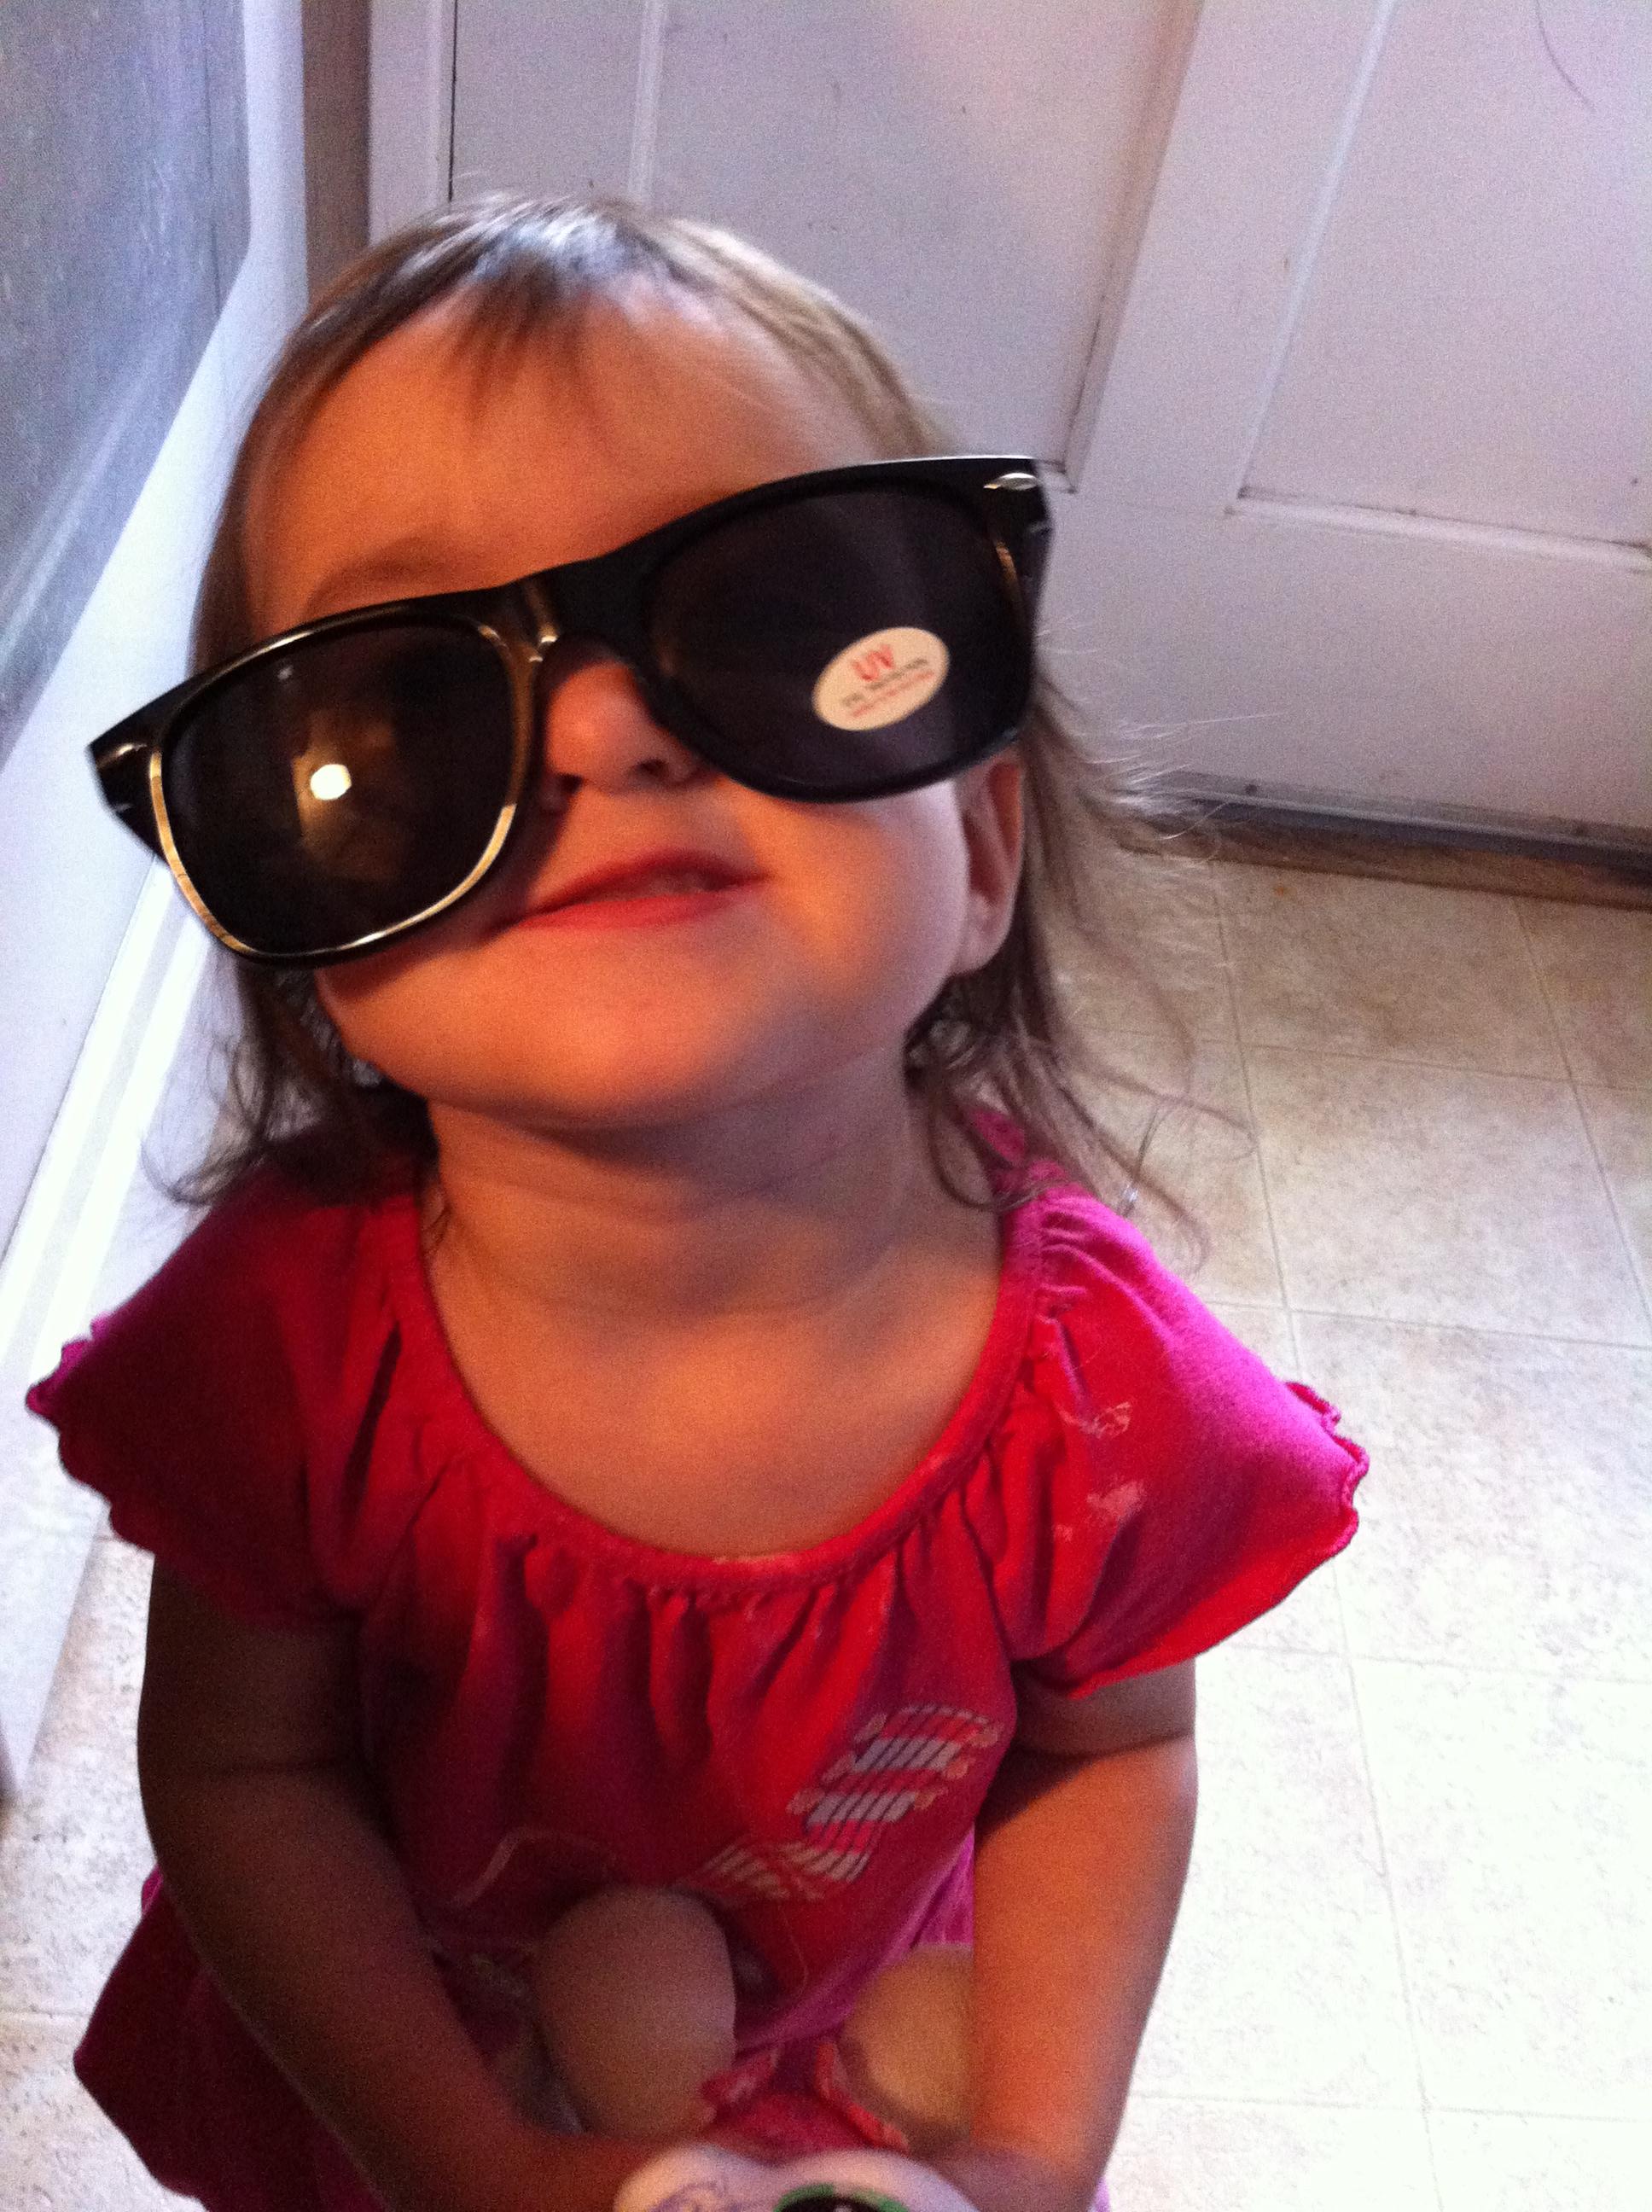 toddler wearing big sunglasses